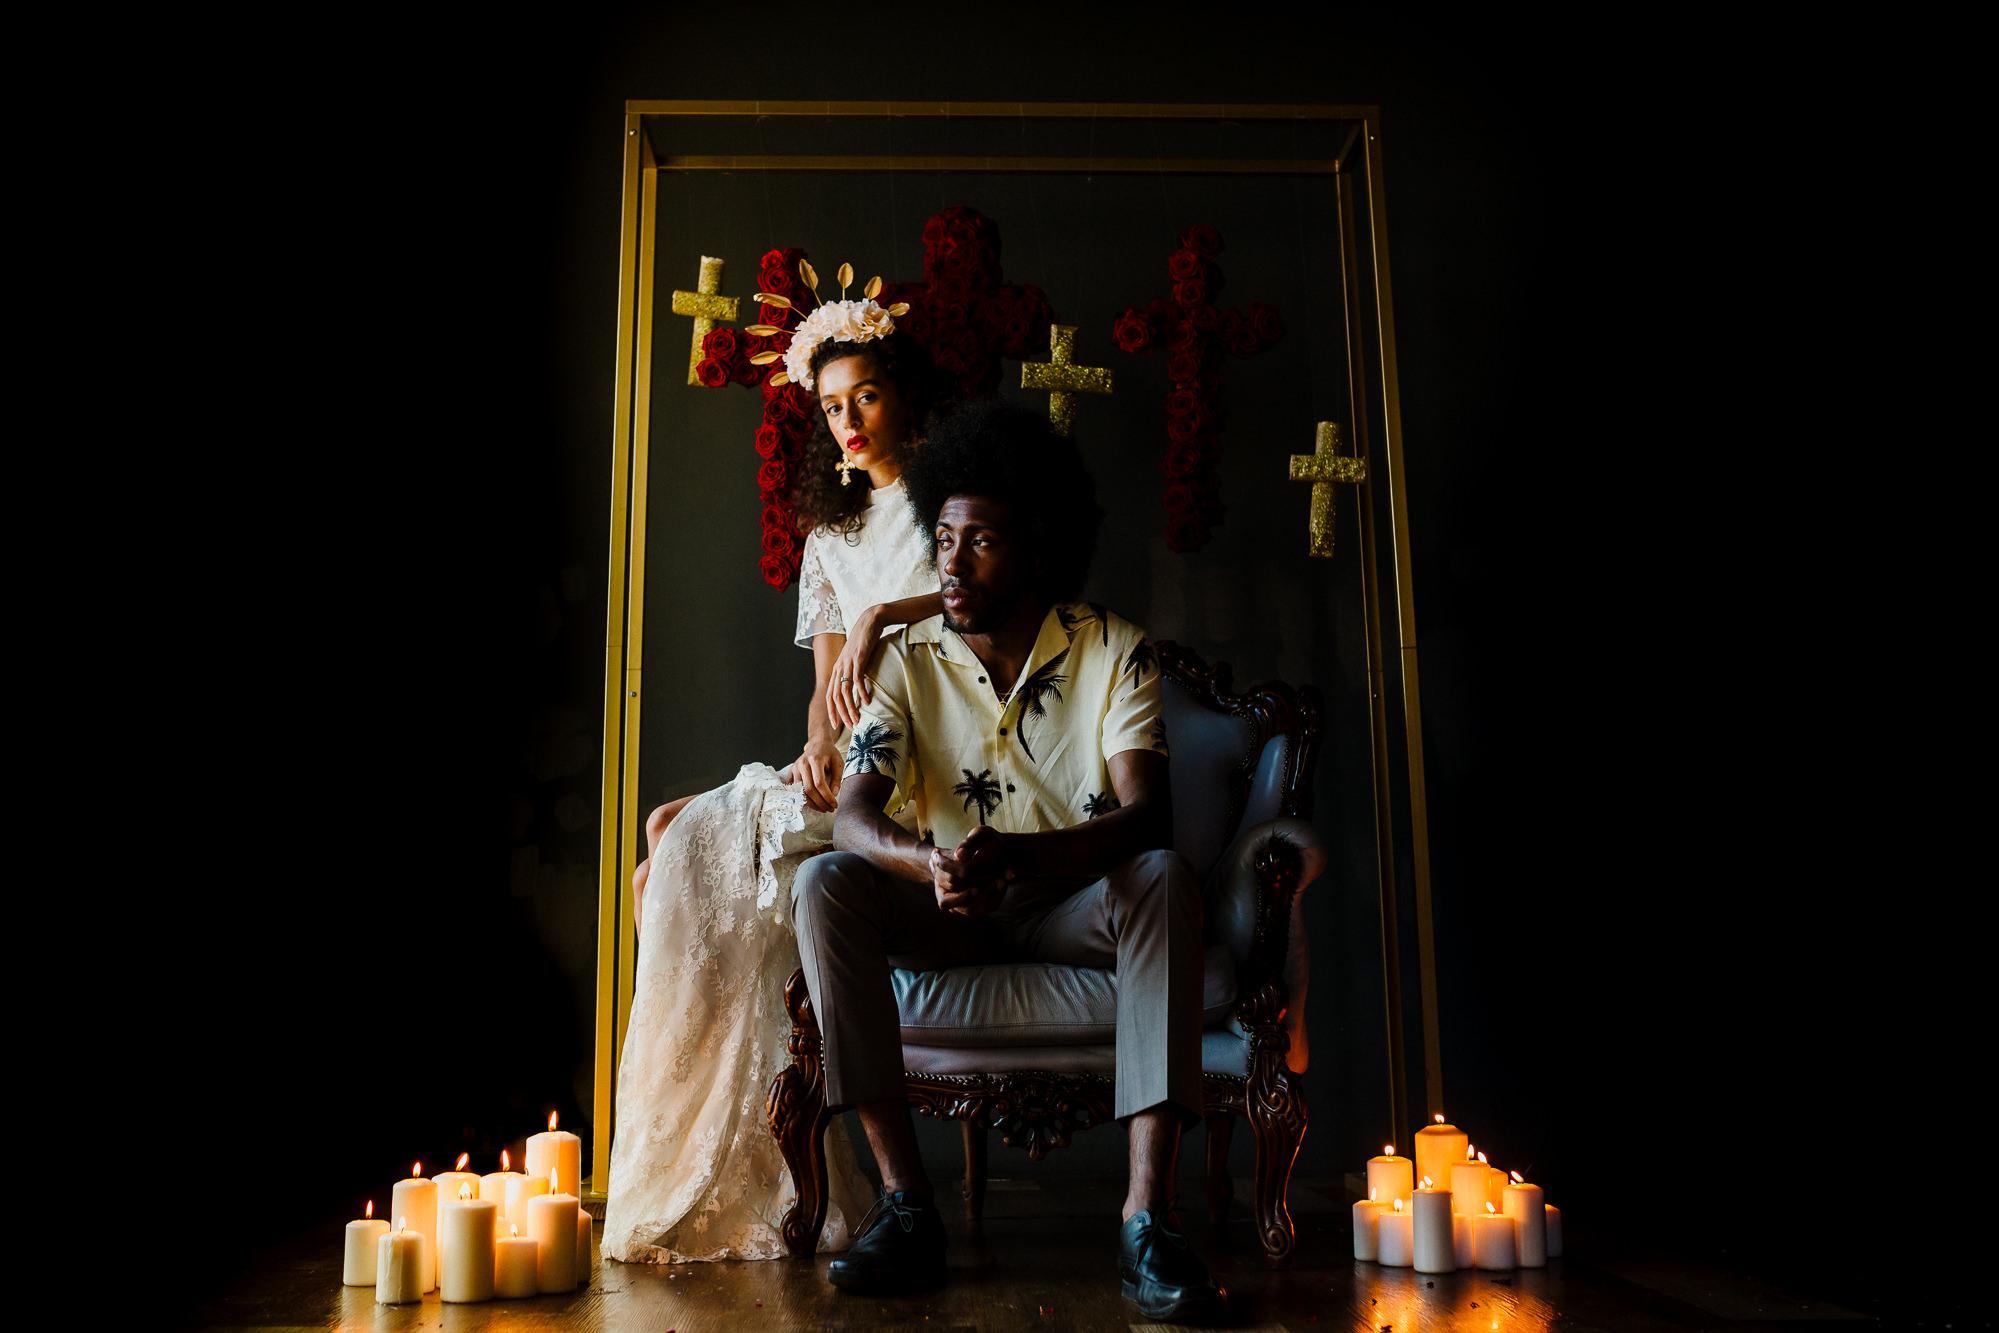 R&J_WEDDING ENTHUSIAST_TIM_DUNK-71.jpg